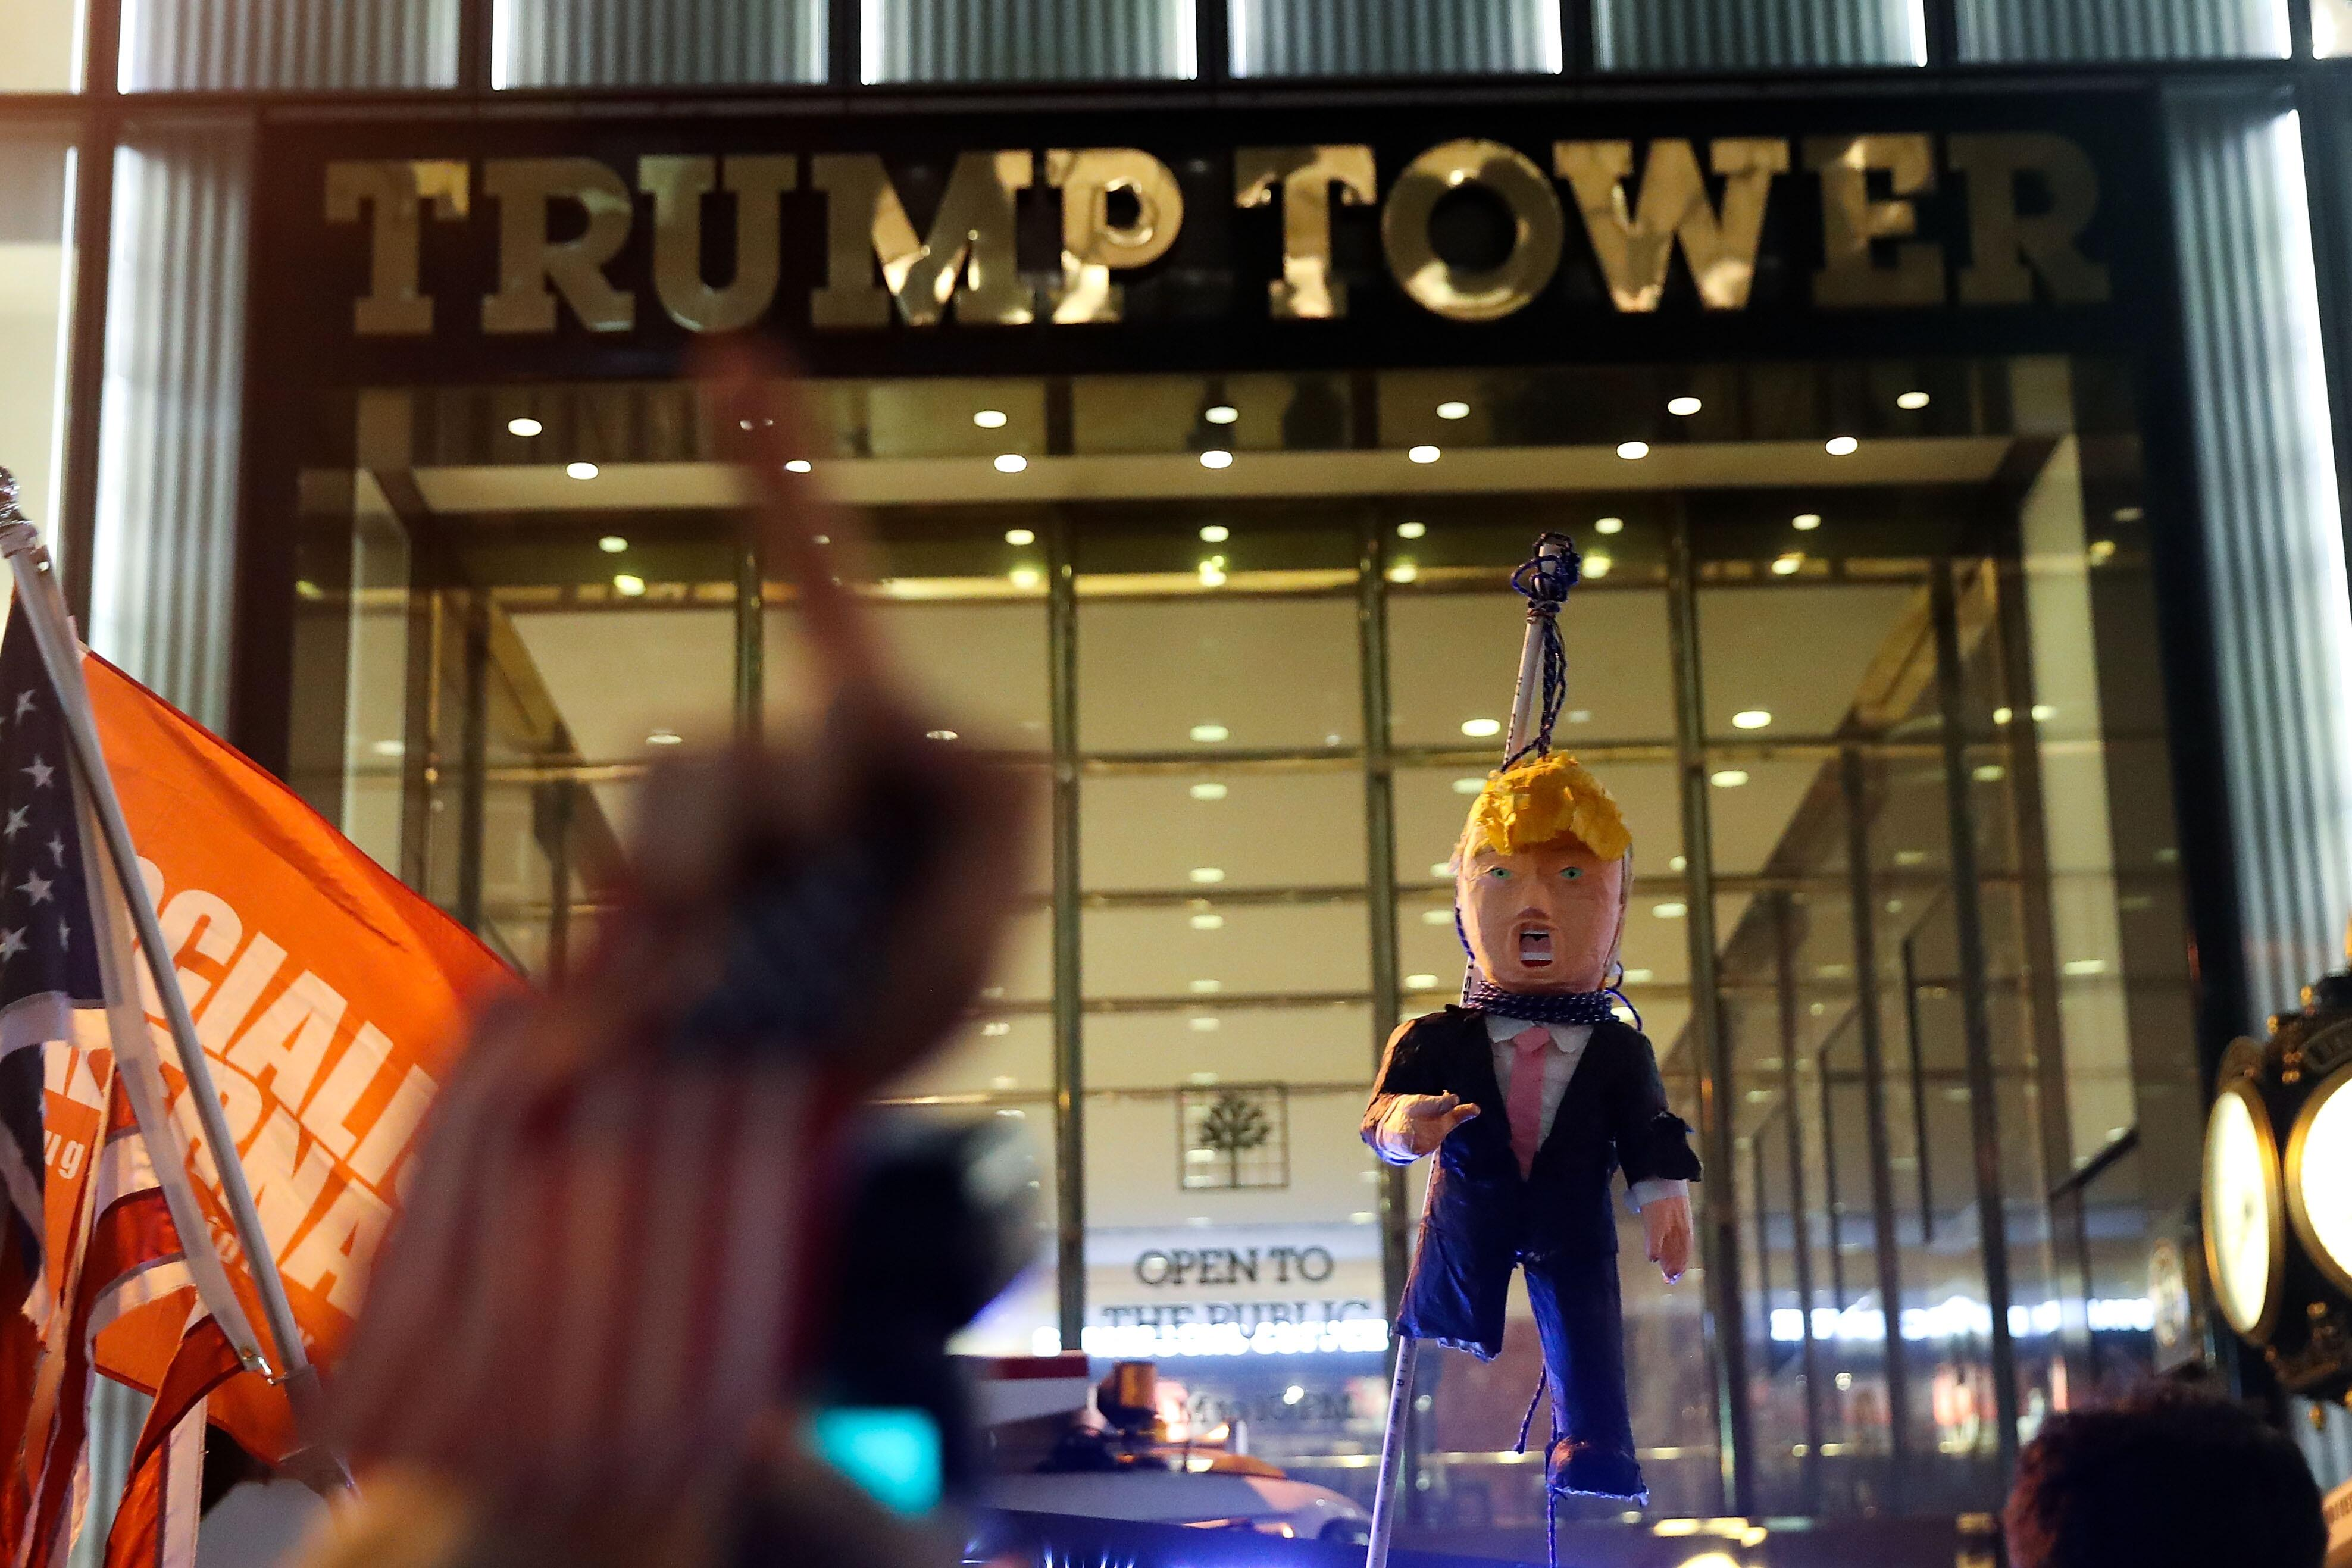 Bild zu US-Wahl, Donald Trump, Trump Tower, Demonstration